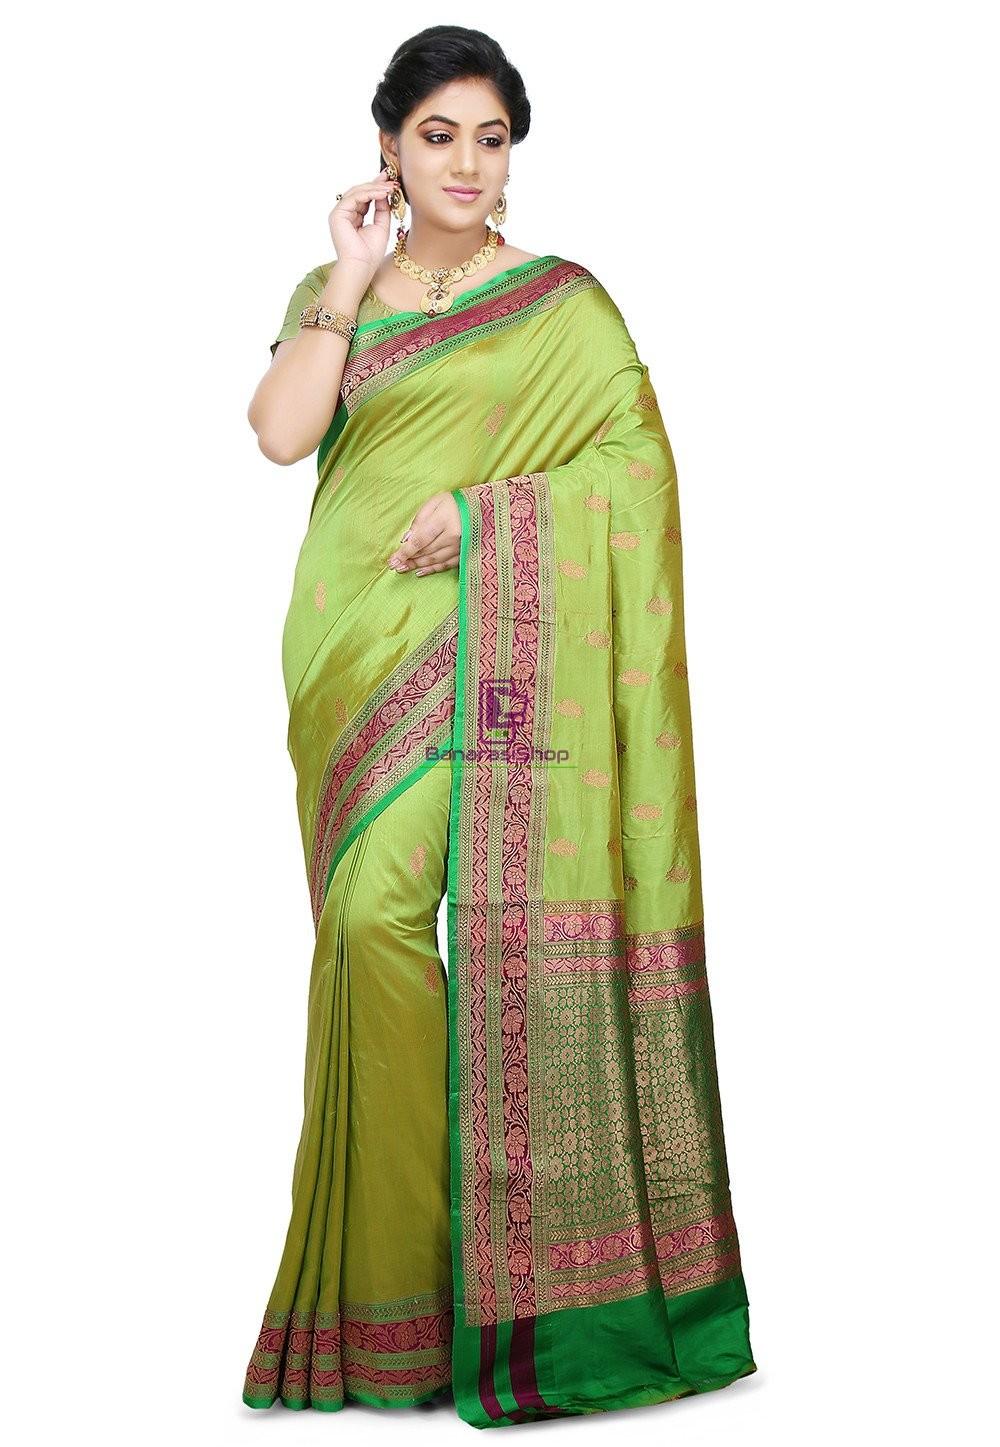 Banarasi Katan Silk Handloom Saree in Light Green 1